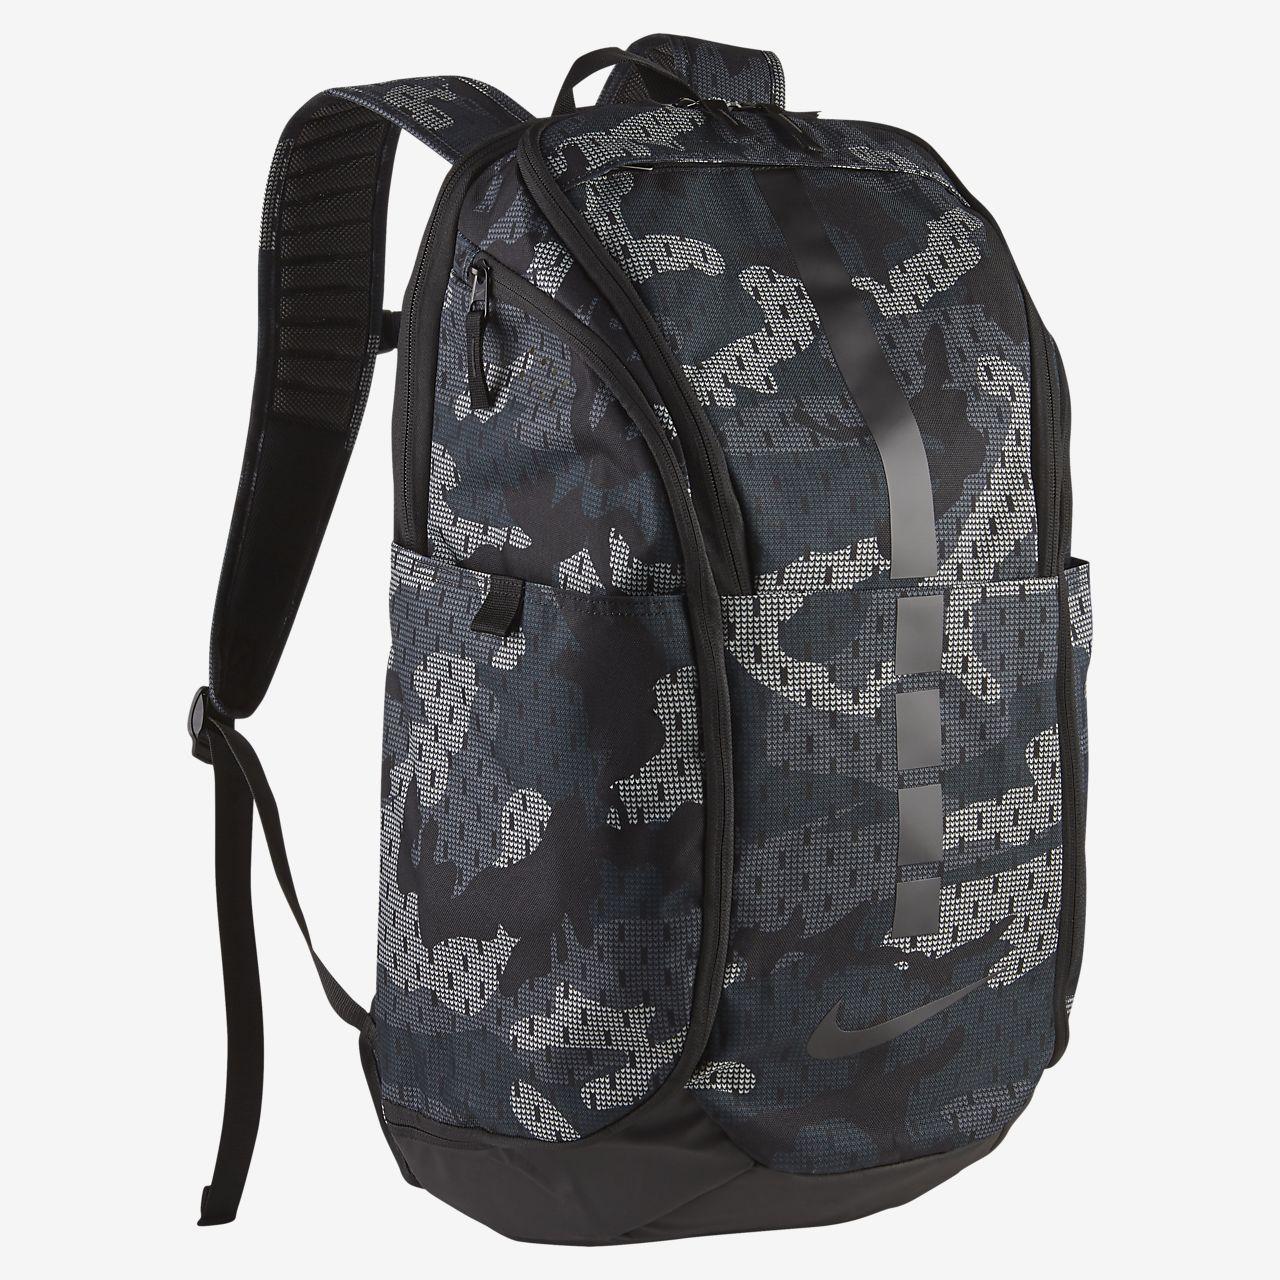 wholesale dealer 2172c 89ca6 Basketball Backpack. Nike Hoops Elite Pro